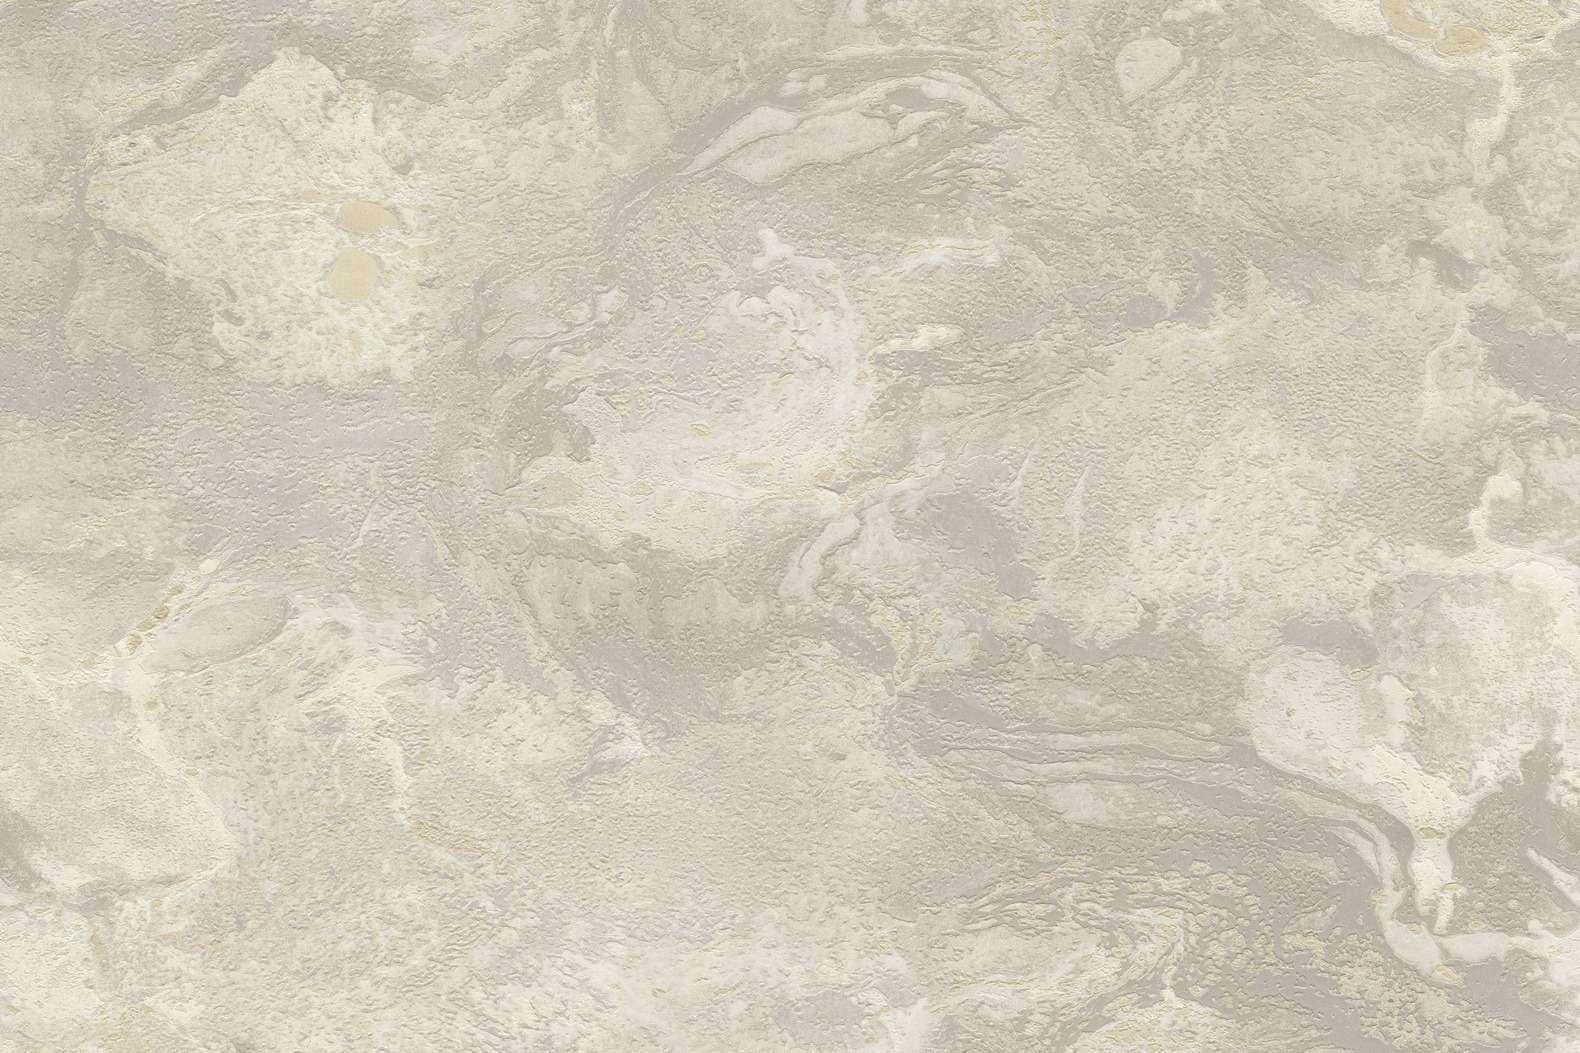 Обои Decori & Decori Carrara 2 — Декори Каррара 2 83662